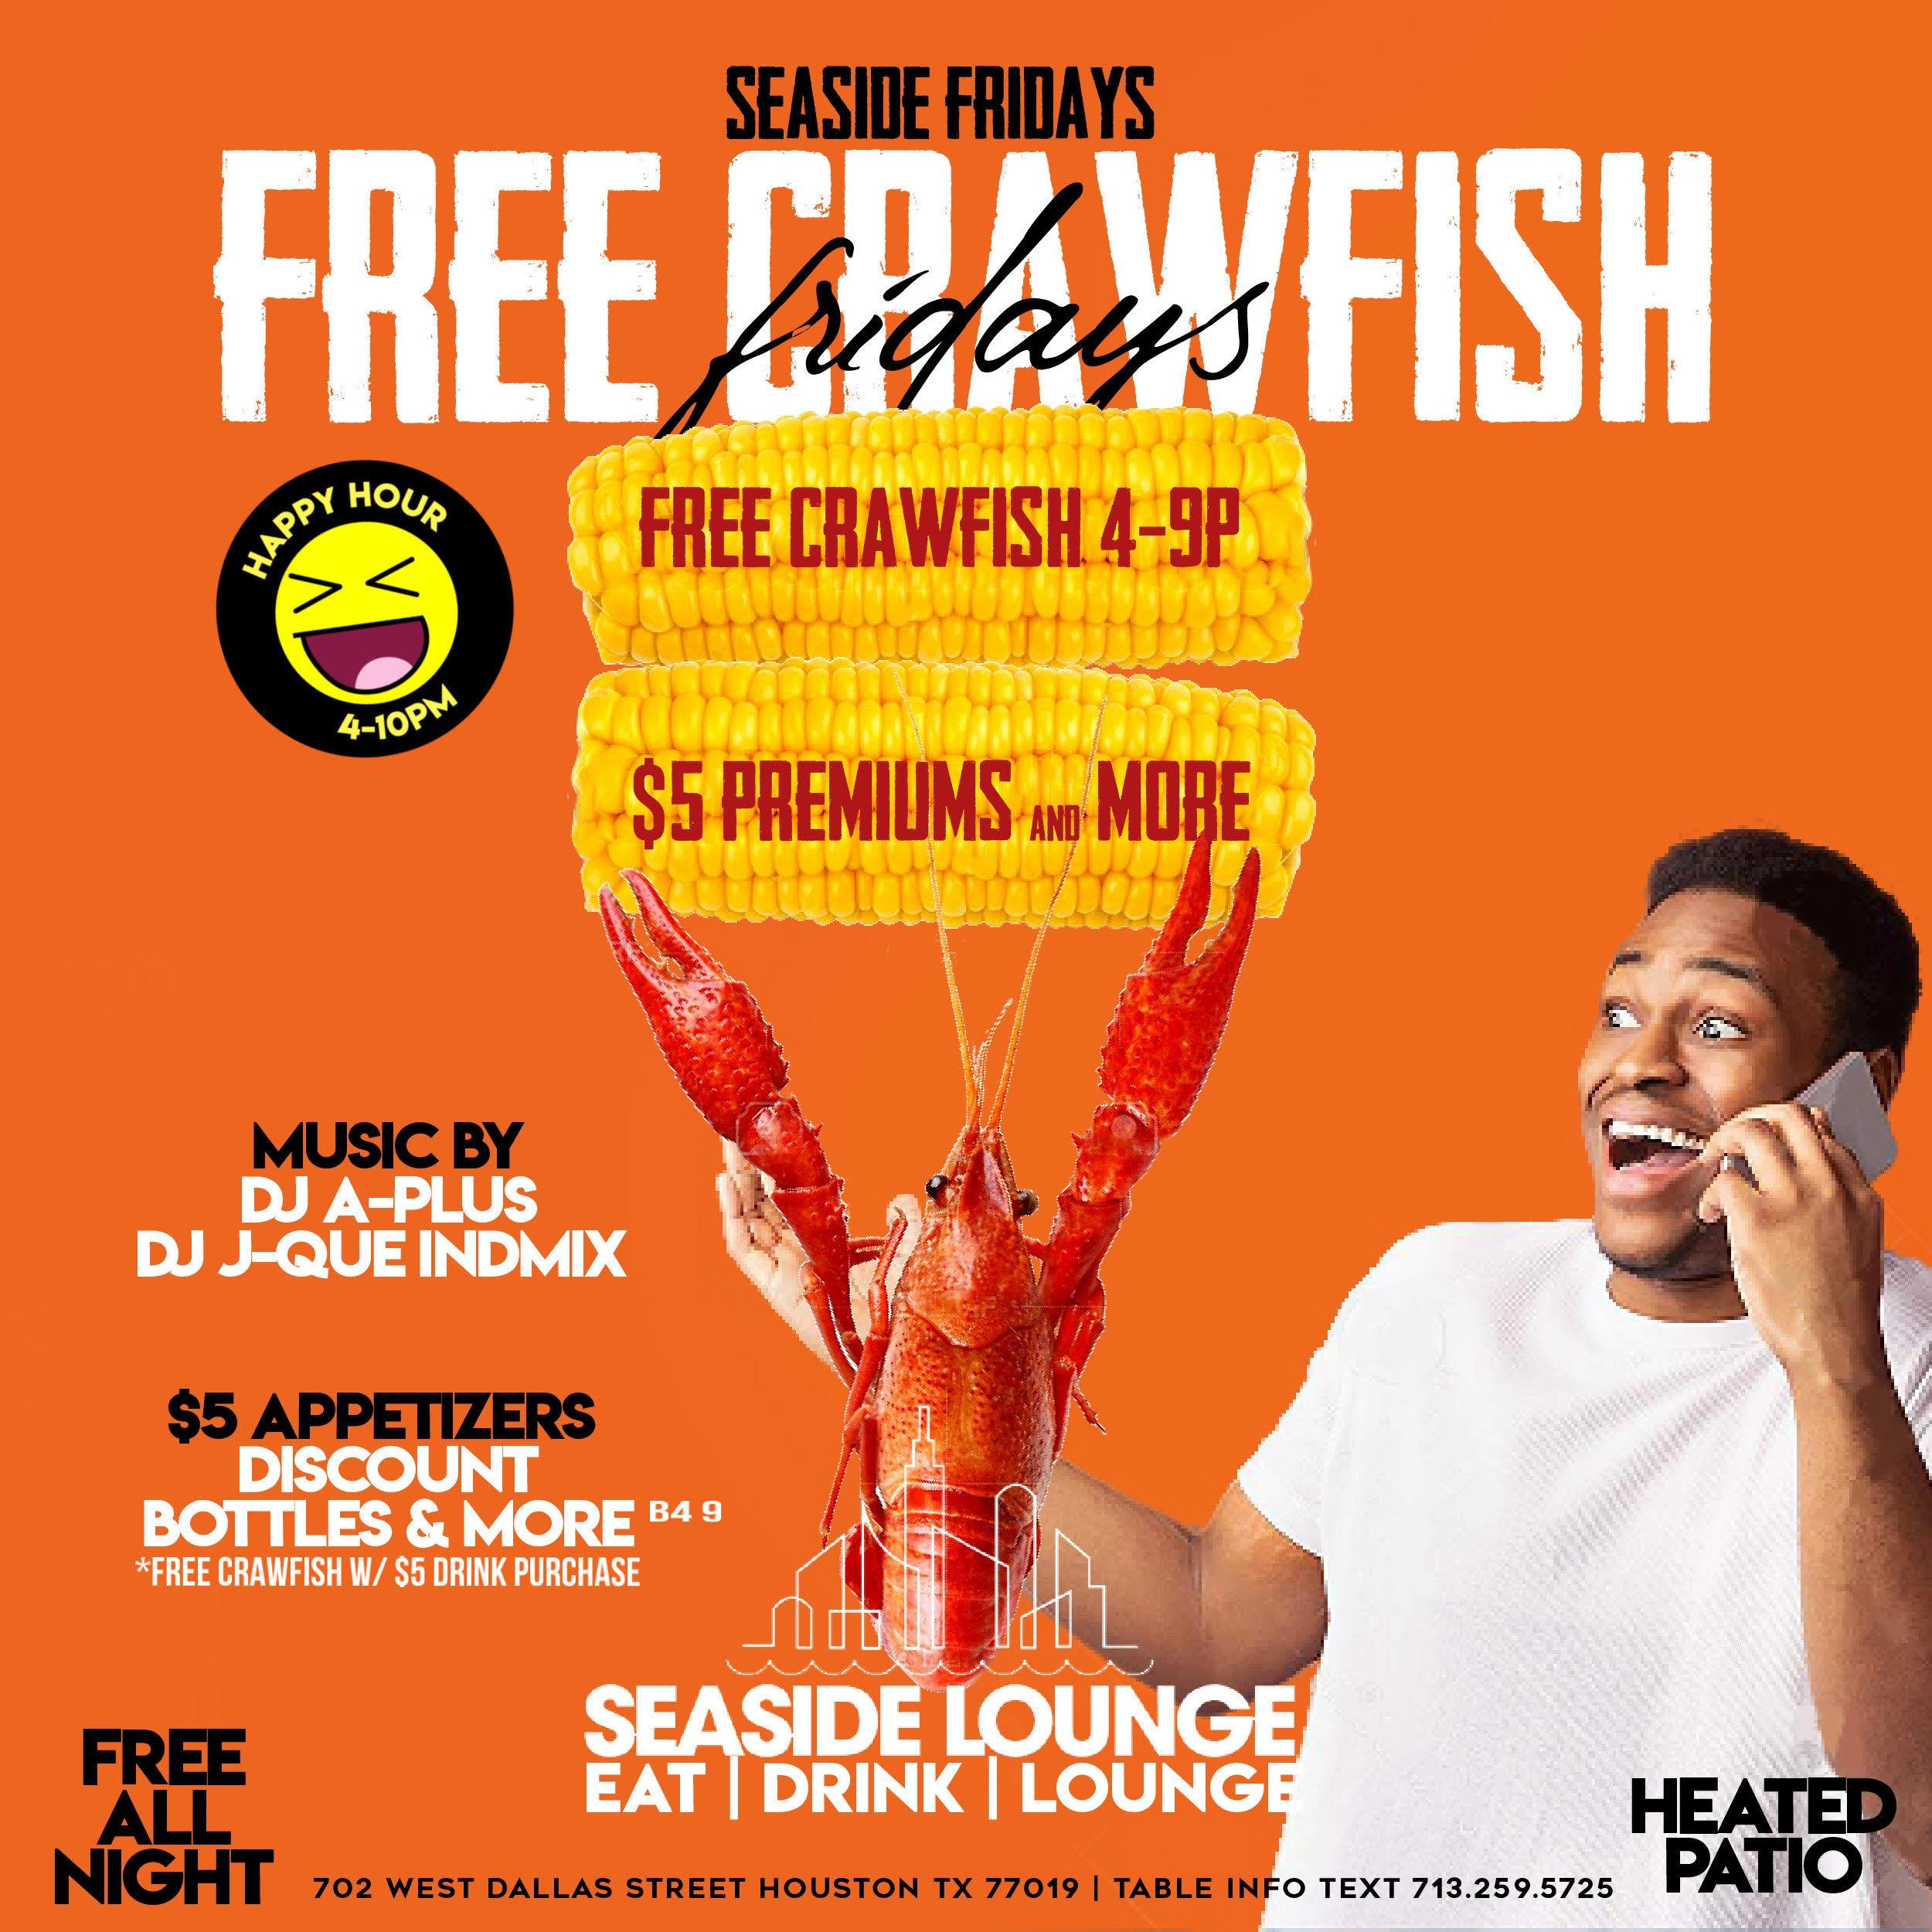 FREE CRAWFISH Fridays at SEASIDE Happy Hour 4-10PM